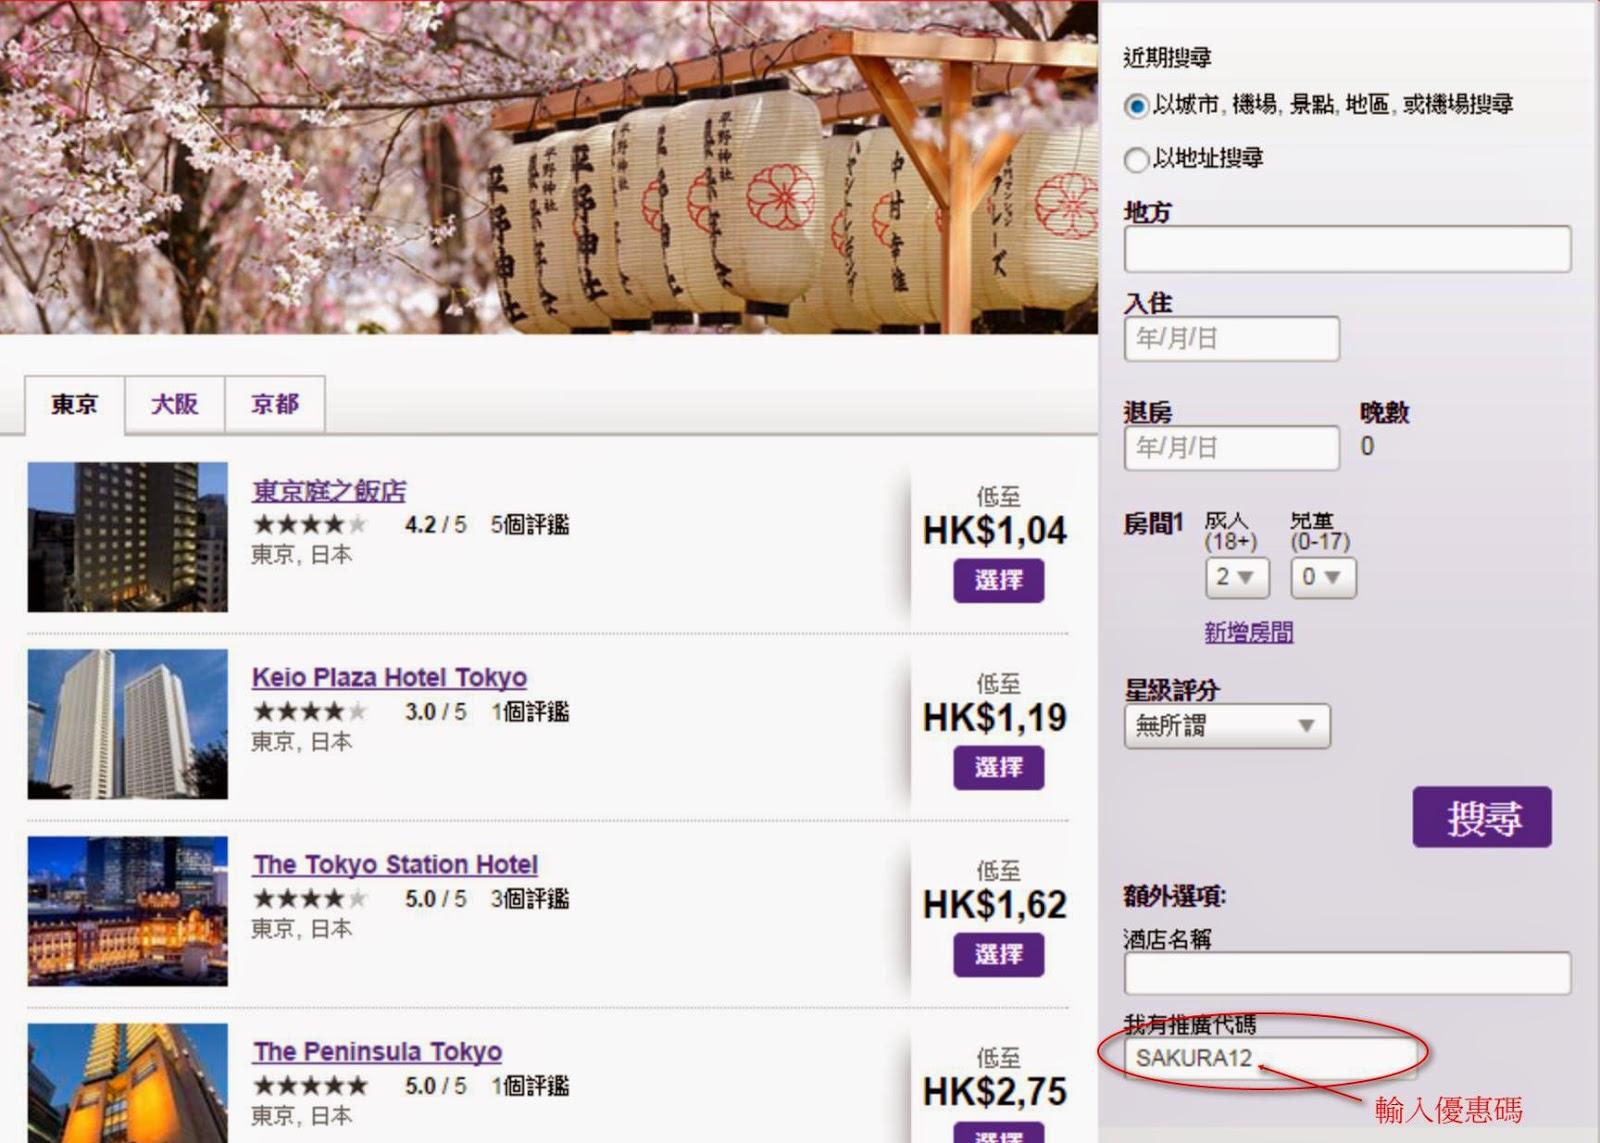 hotelclub 88折優惠碼【SAKURA12】